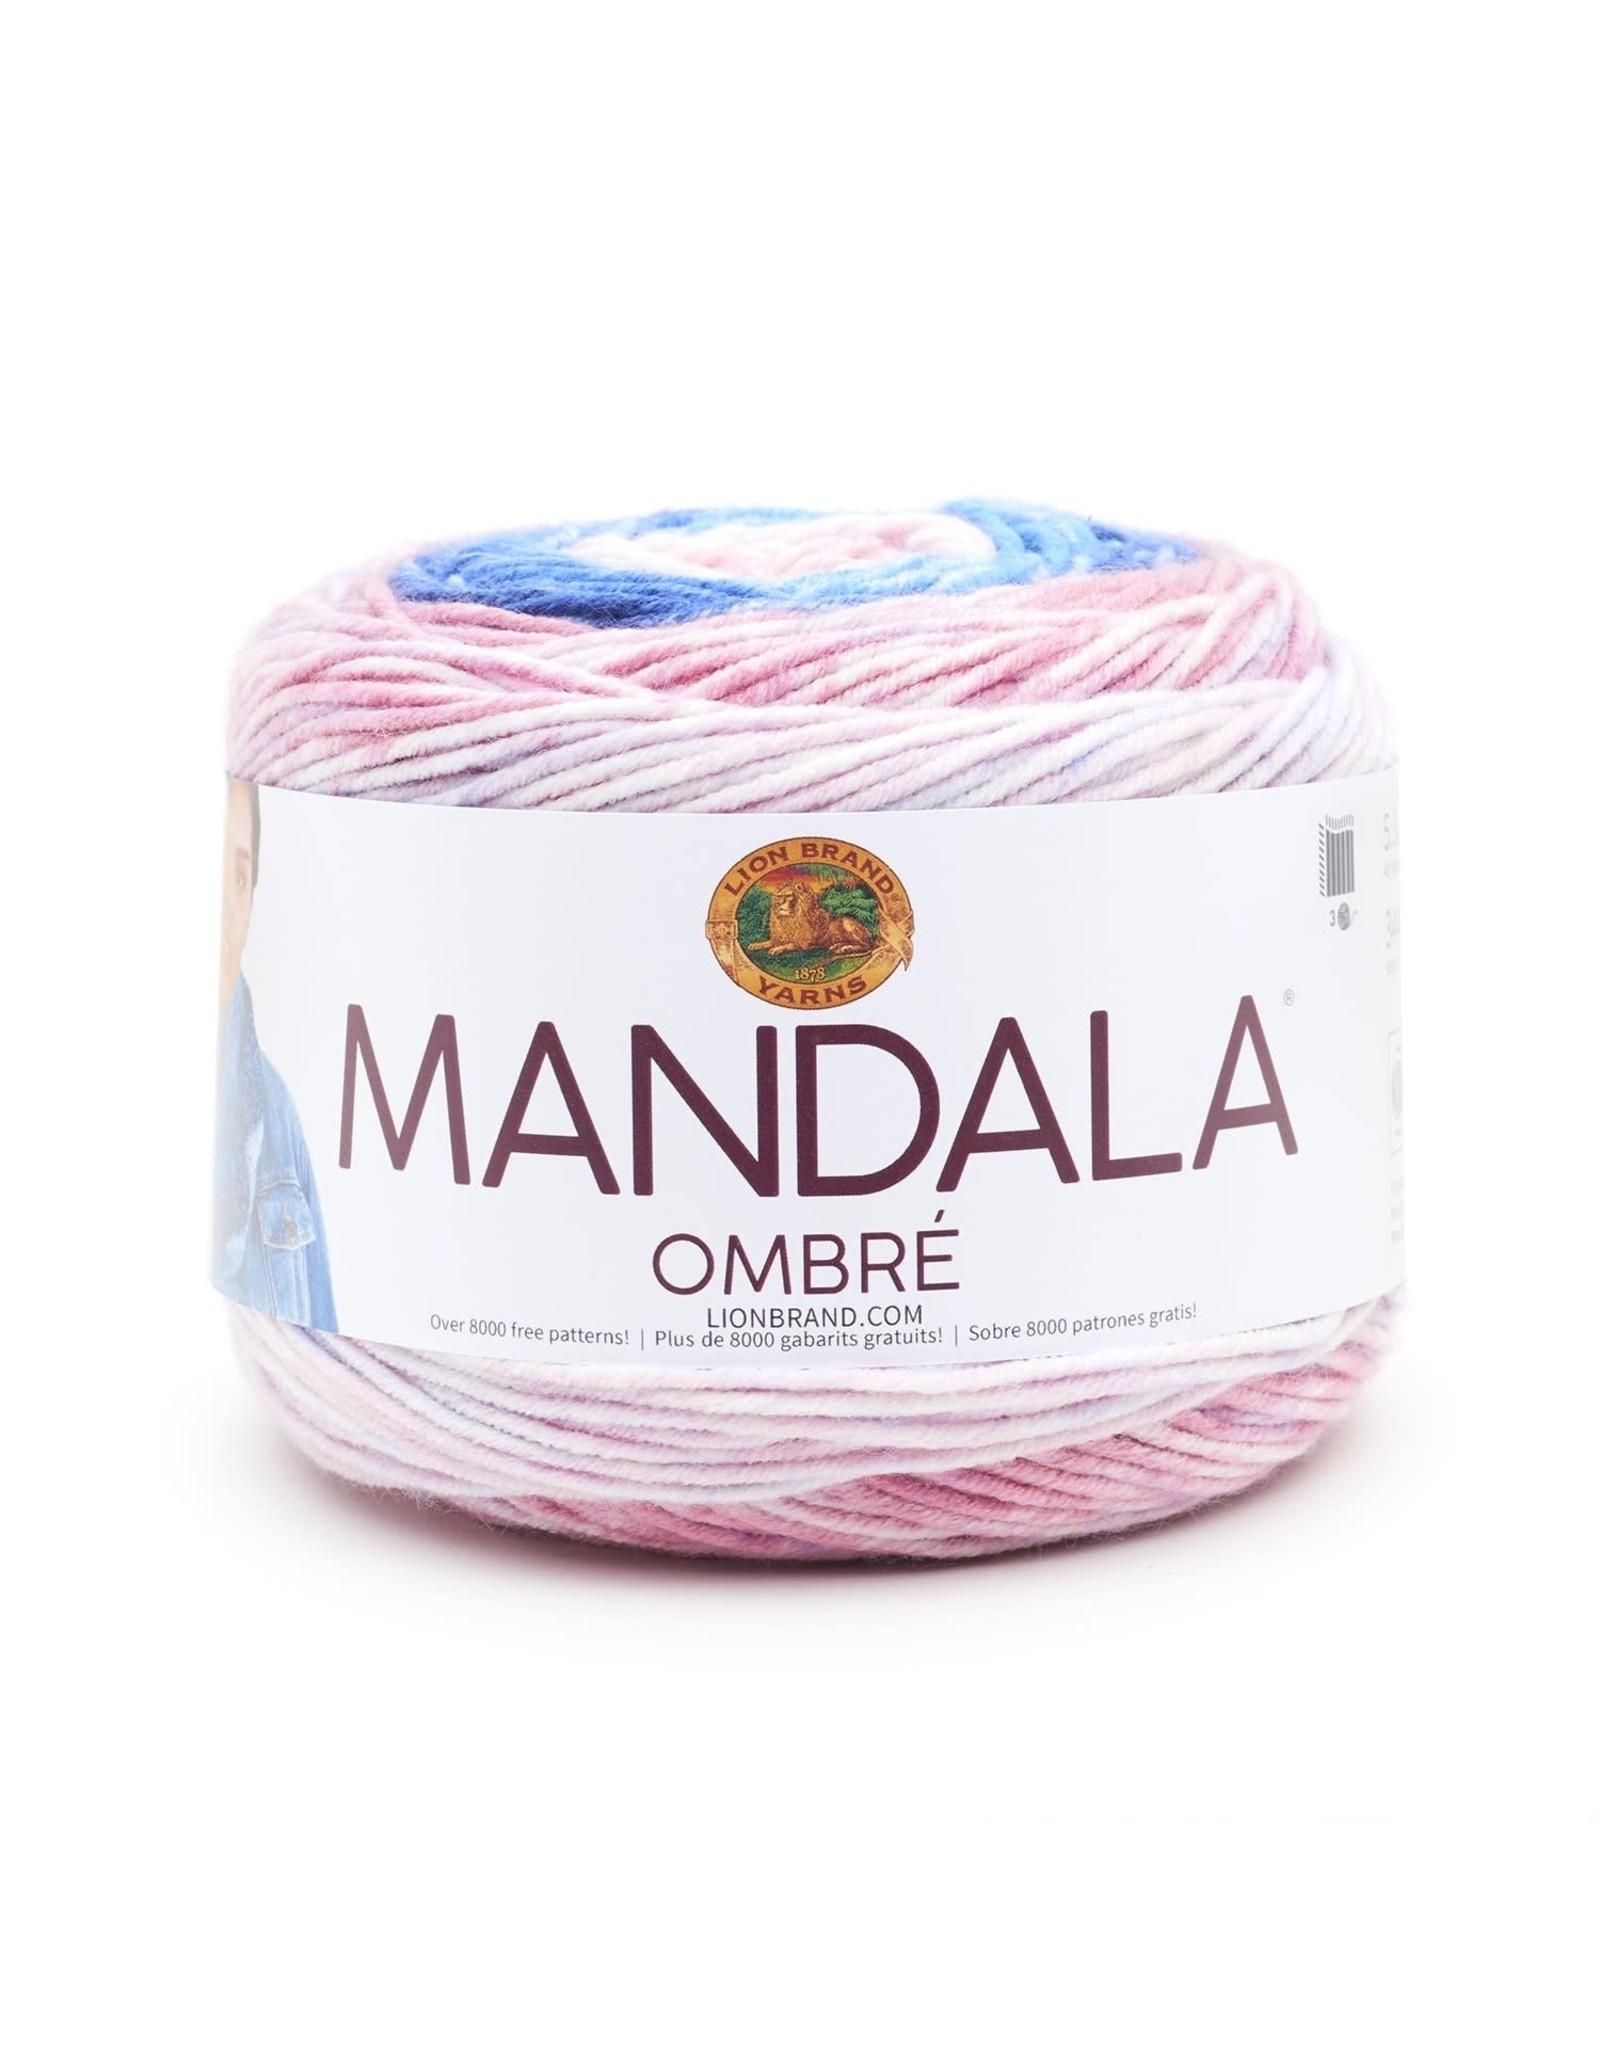 Pure - Mandala Ombre - Lion Brand